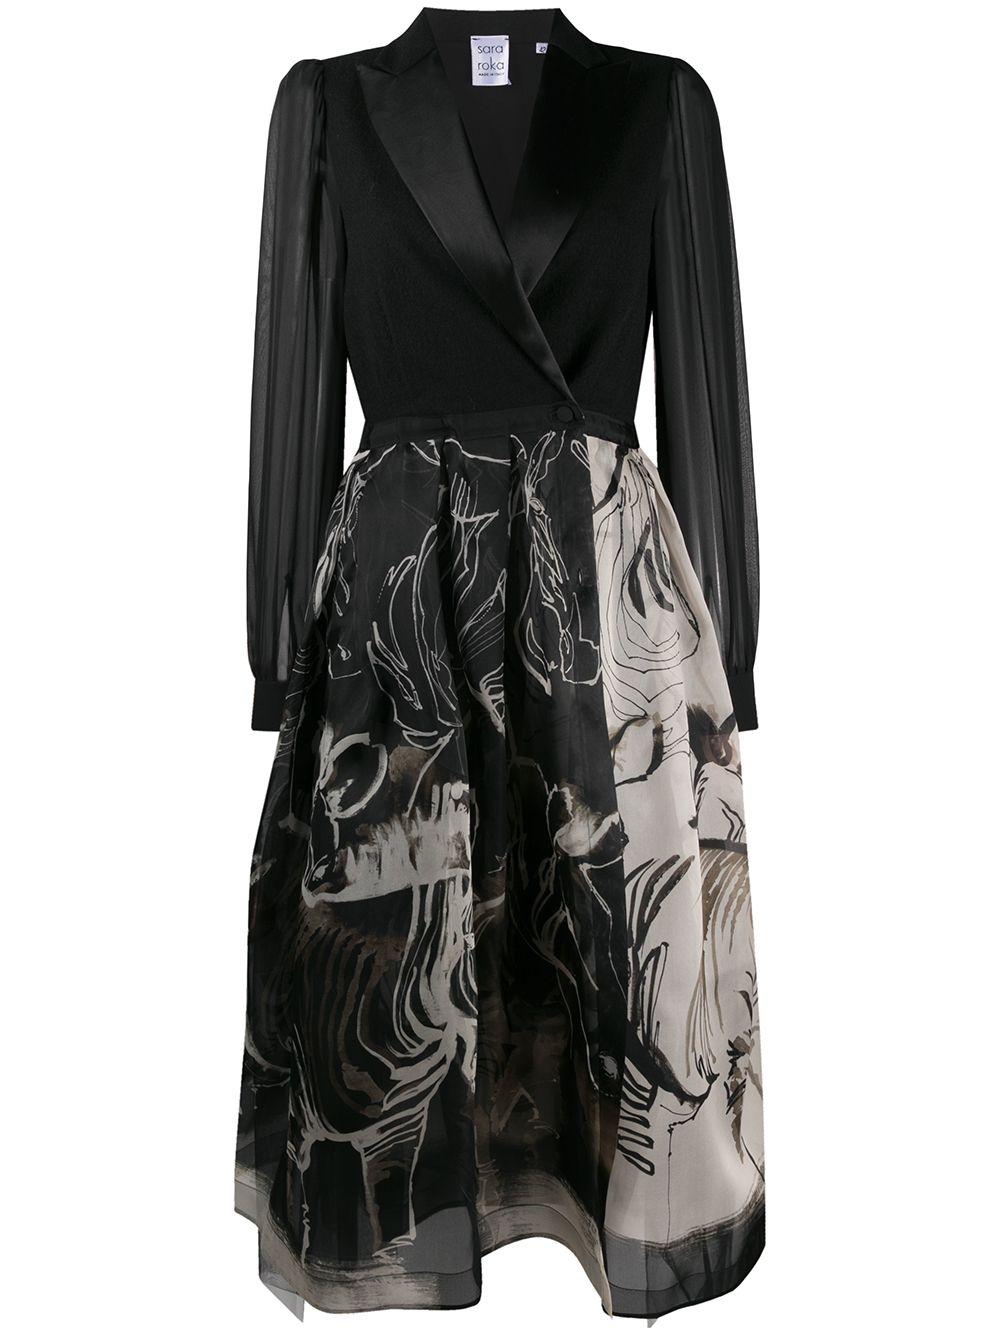 Black and white virgin wool and silk Areta buttoned wrap dress featuring abstract pattern print SARA ROKA |  | ARETA LS85-35C